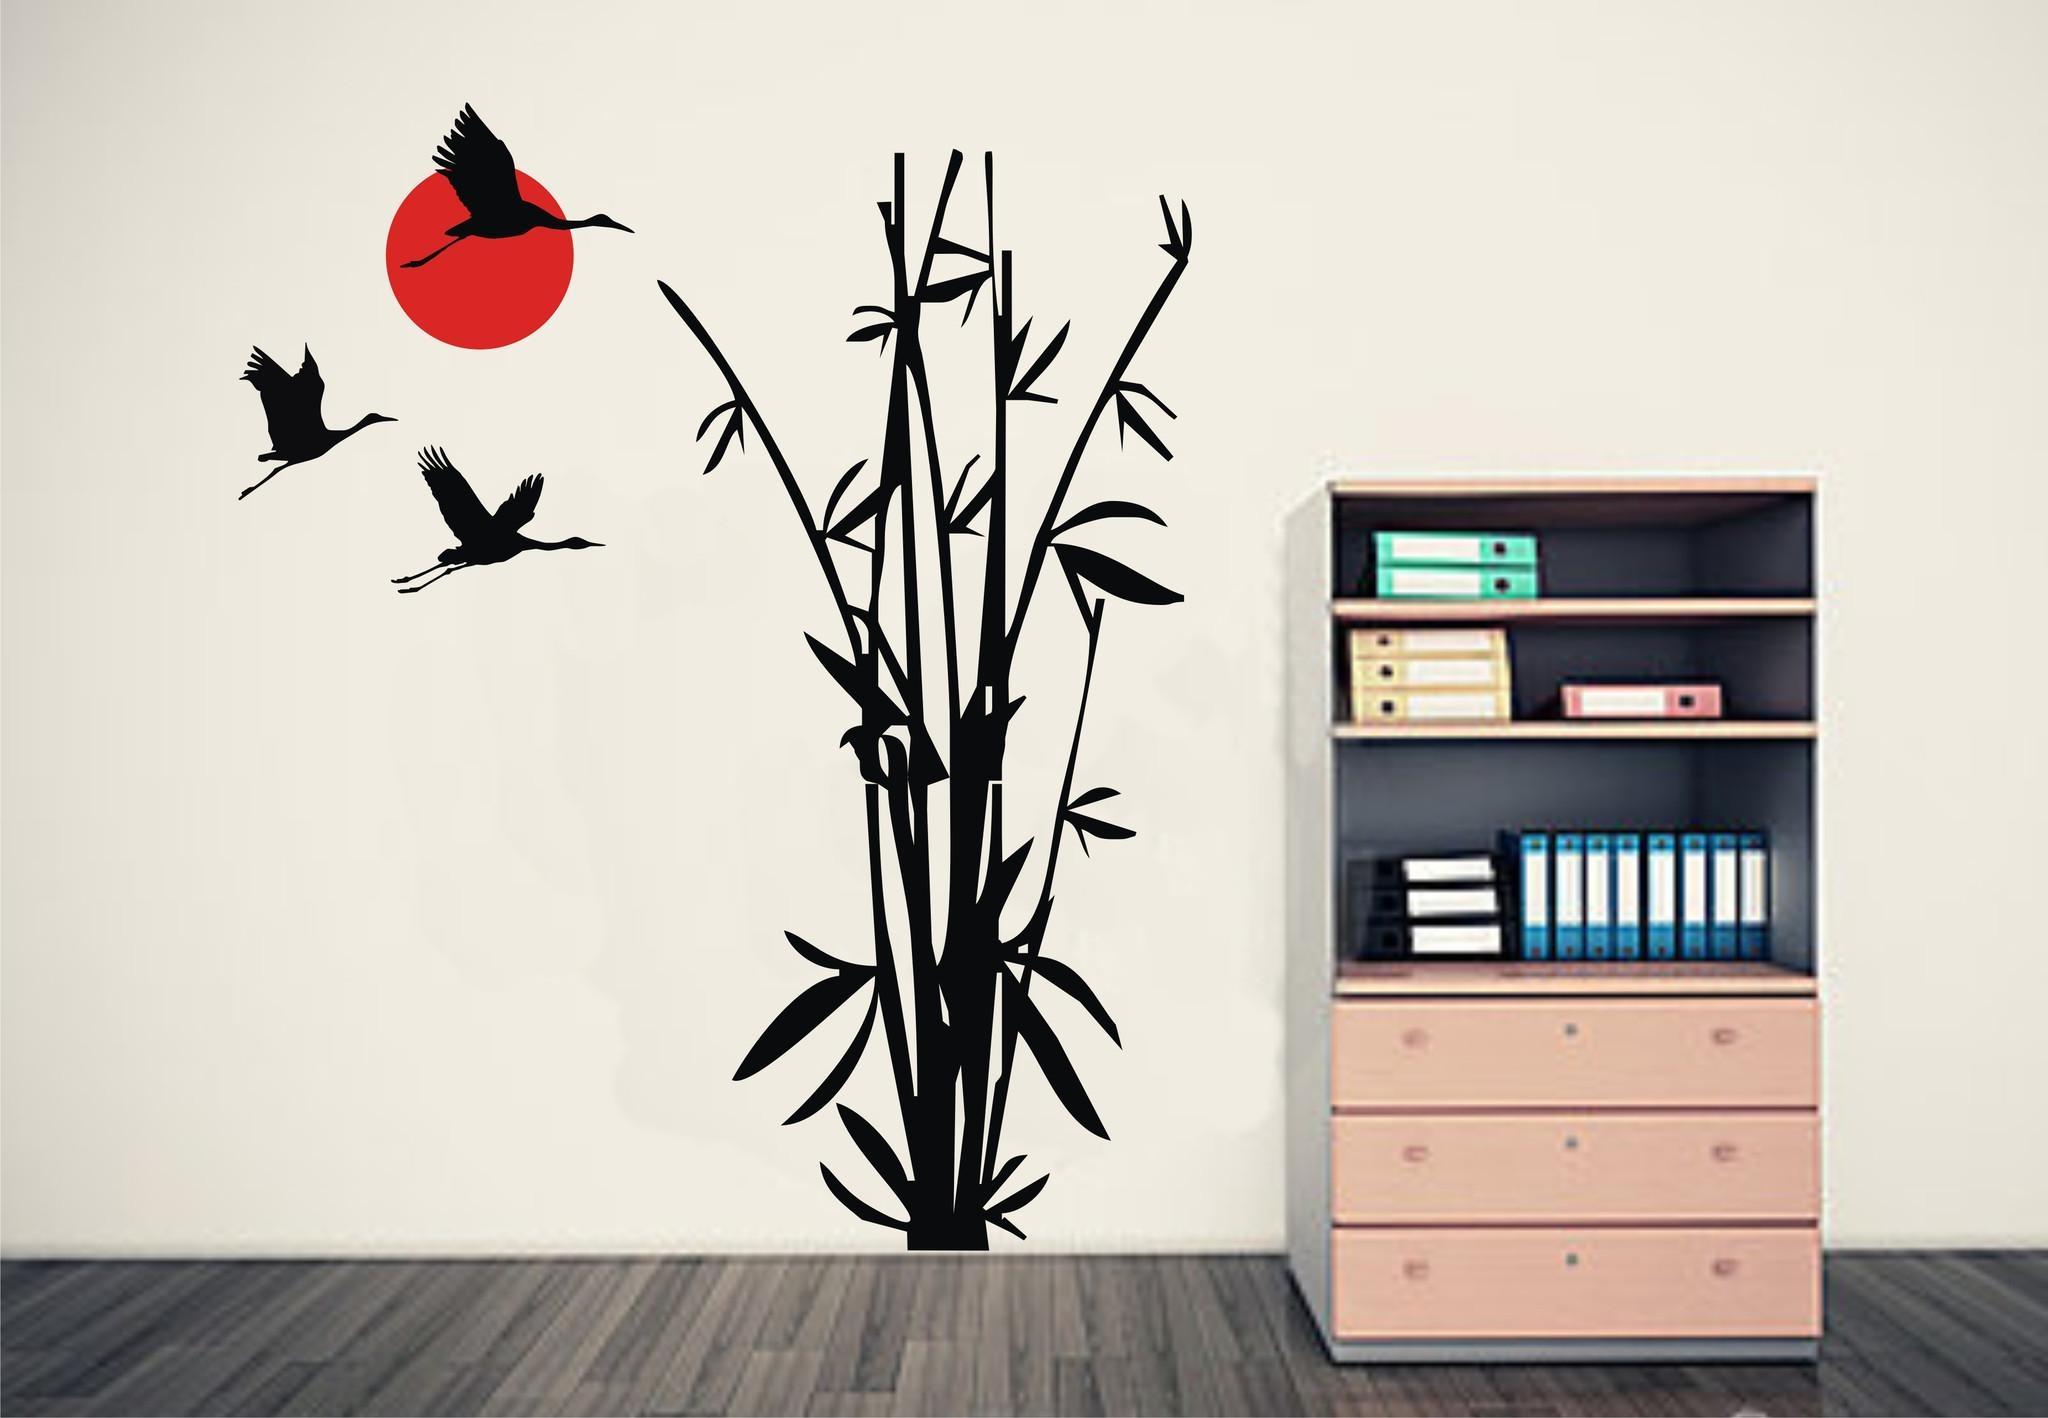 Wall Art Designs: Amusing Wall Art Shop Pottery Barn Tattoo Shop Throughout Wall Art Designs (Image 10 of 20)